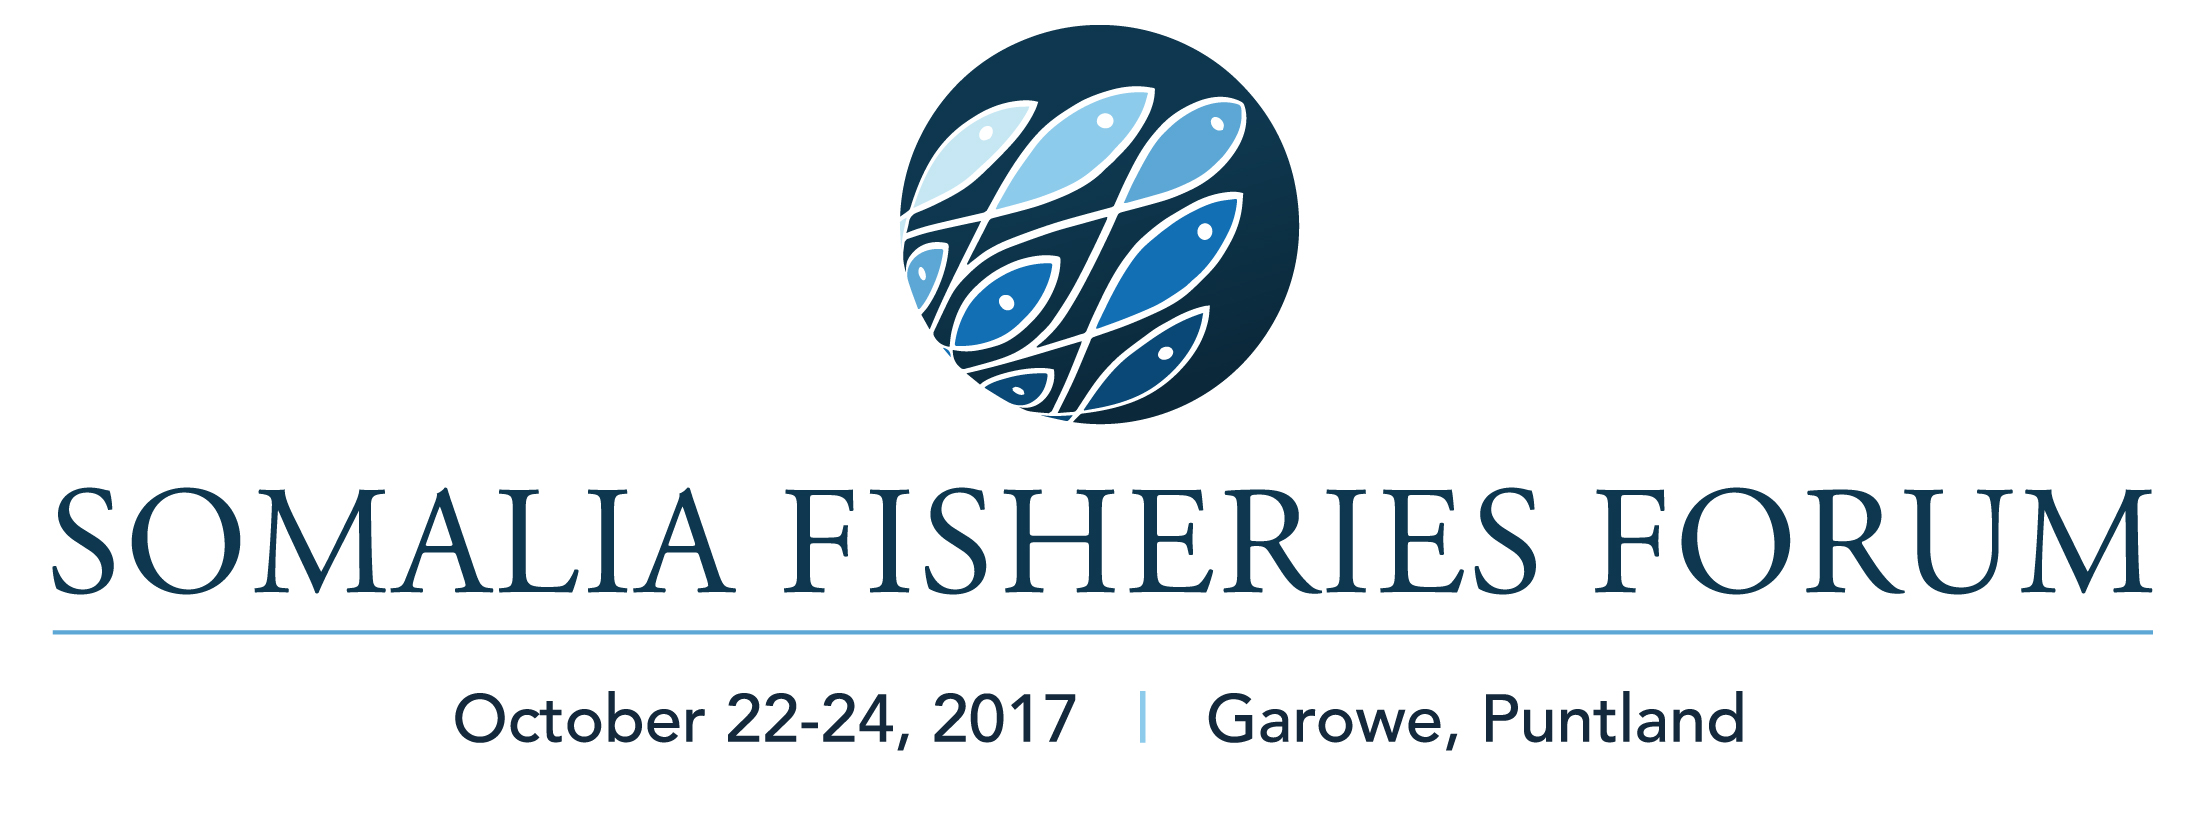 somalia_fisheries_forum_web-02-01